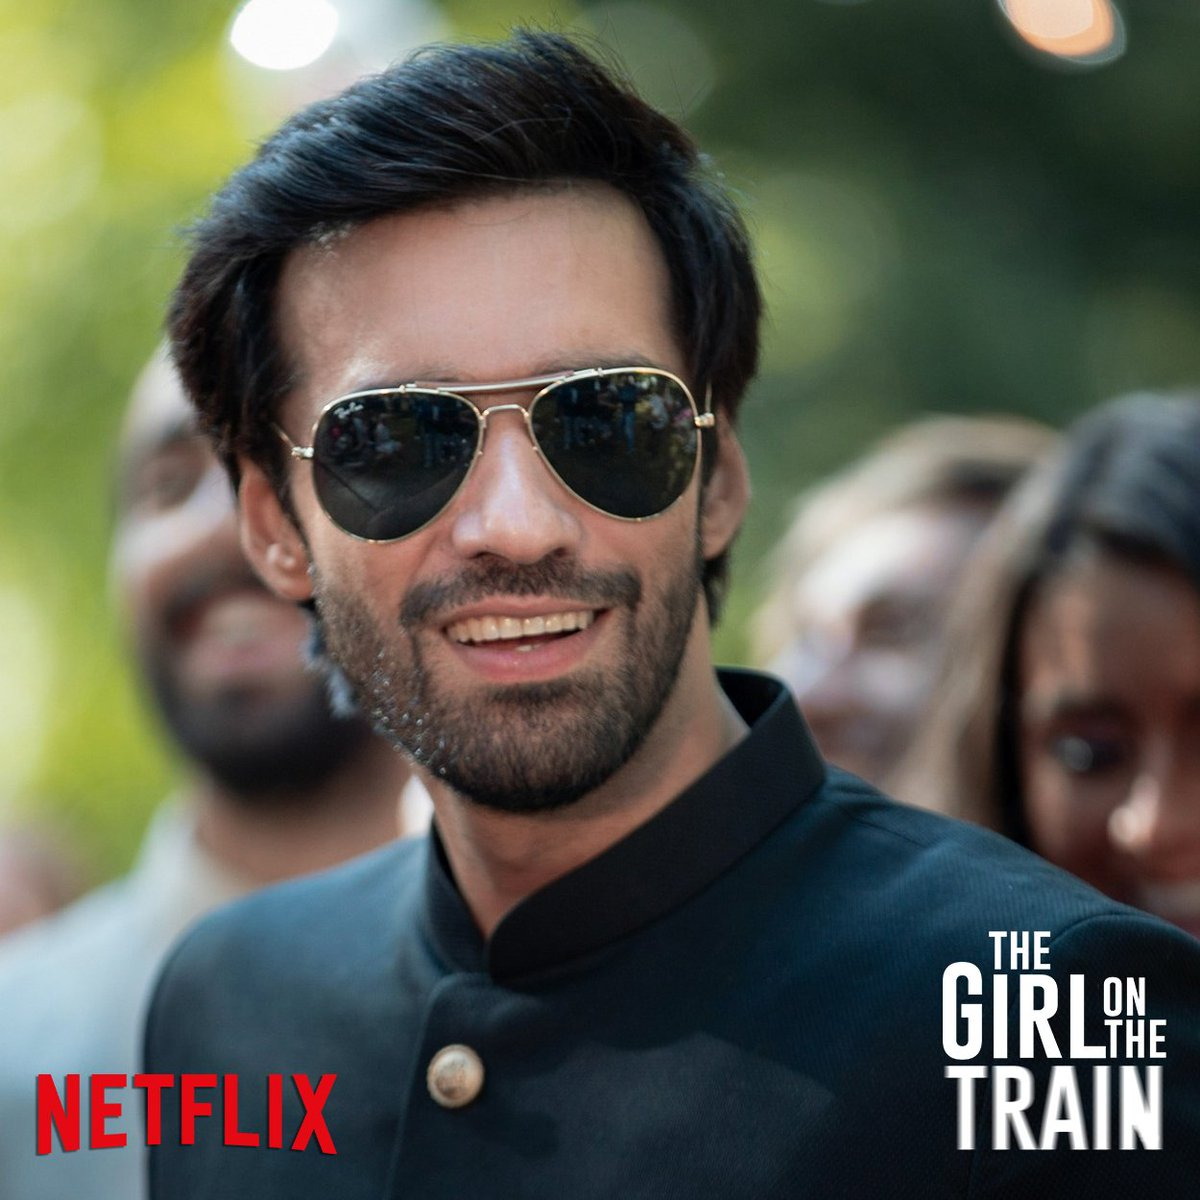 One murder. One suspect. One mystery. This is a train that you don't want to miss. #TGOTT premieres 26th Feb, only on Netflix.  @avinashtiw85 @ParineetiChopra @aditiraohydari @IamKirtiKulhari @tota_rc @SHAMAUN@ribhudasgupta @Shibasishsarkar @amblin @ZeeMusicCompany @NetflixIndia